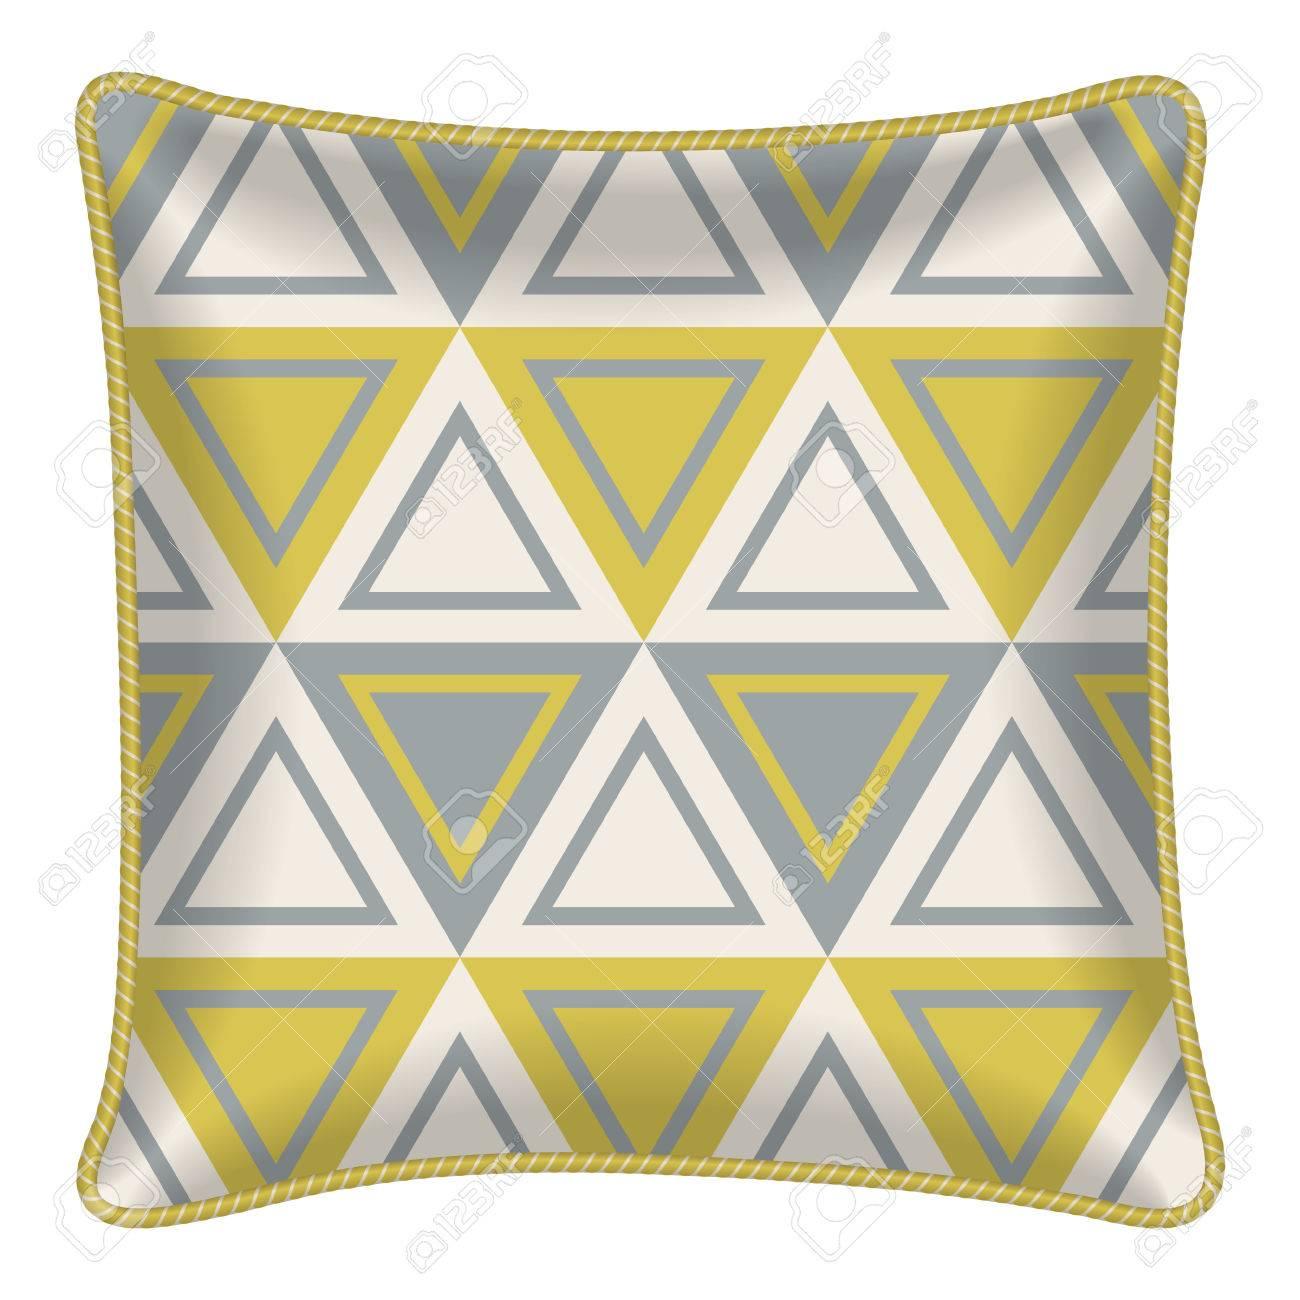 Interior Design Element Decorative Pillow Patterned Pillowcase Mustard Grey Triangles Pattern